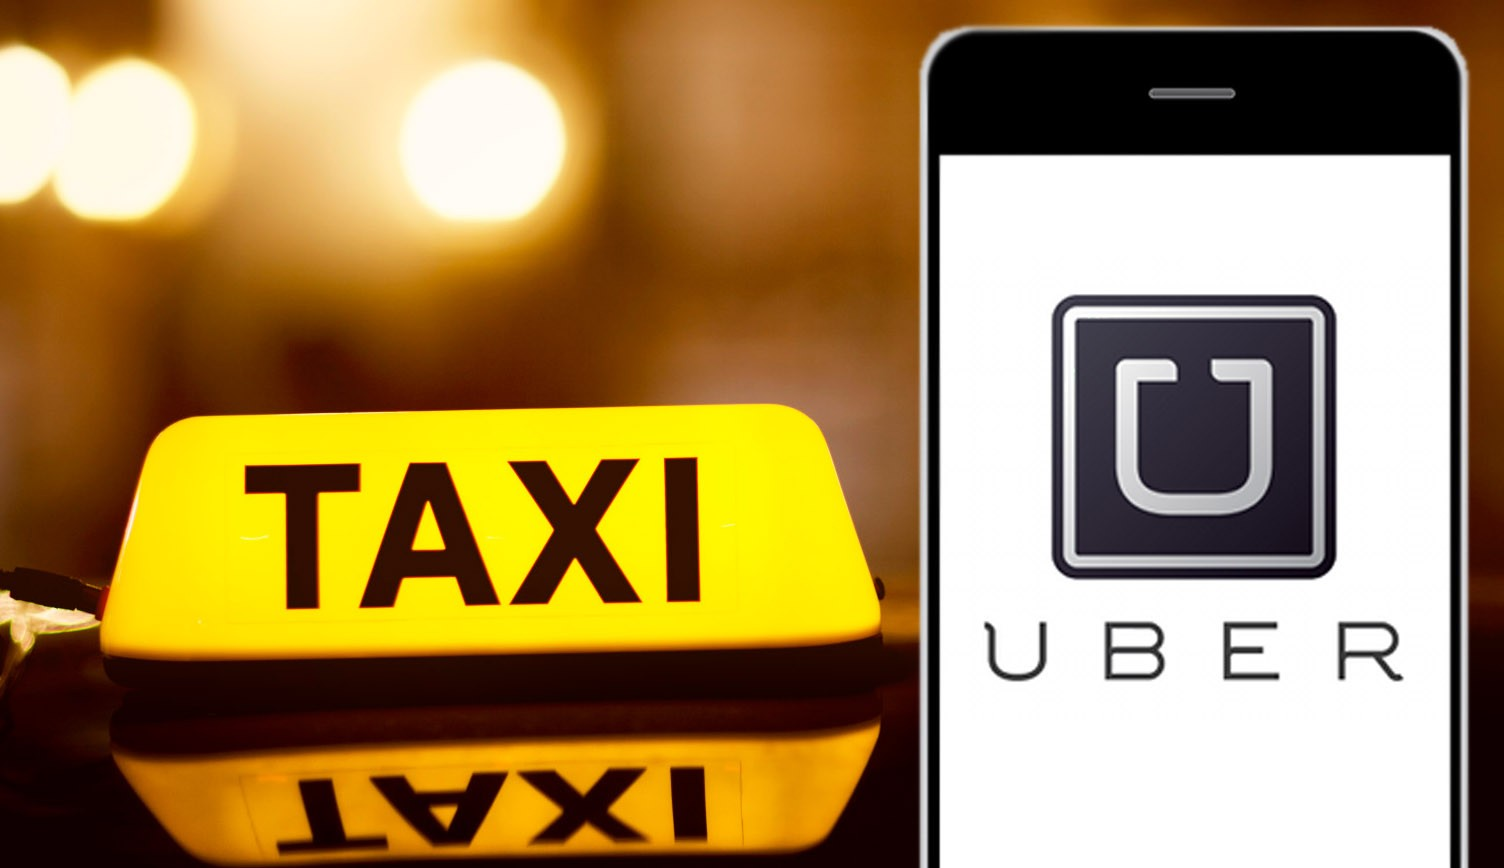 ВДании суд объявил незаконным сервис Uber